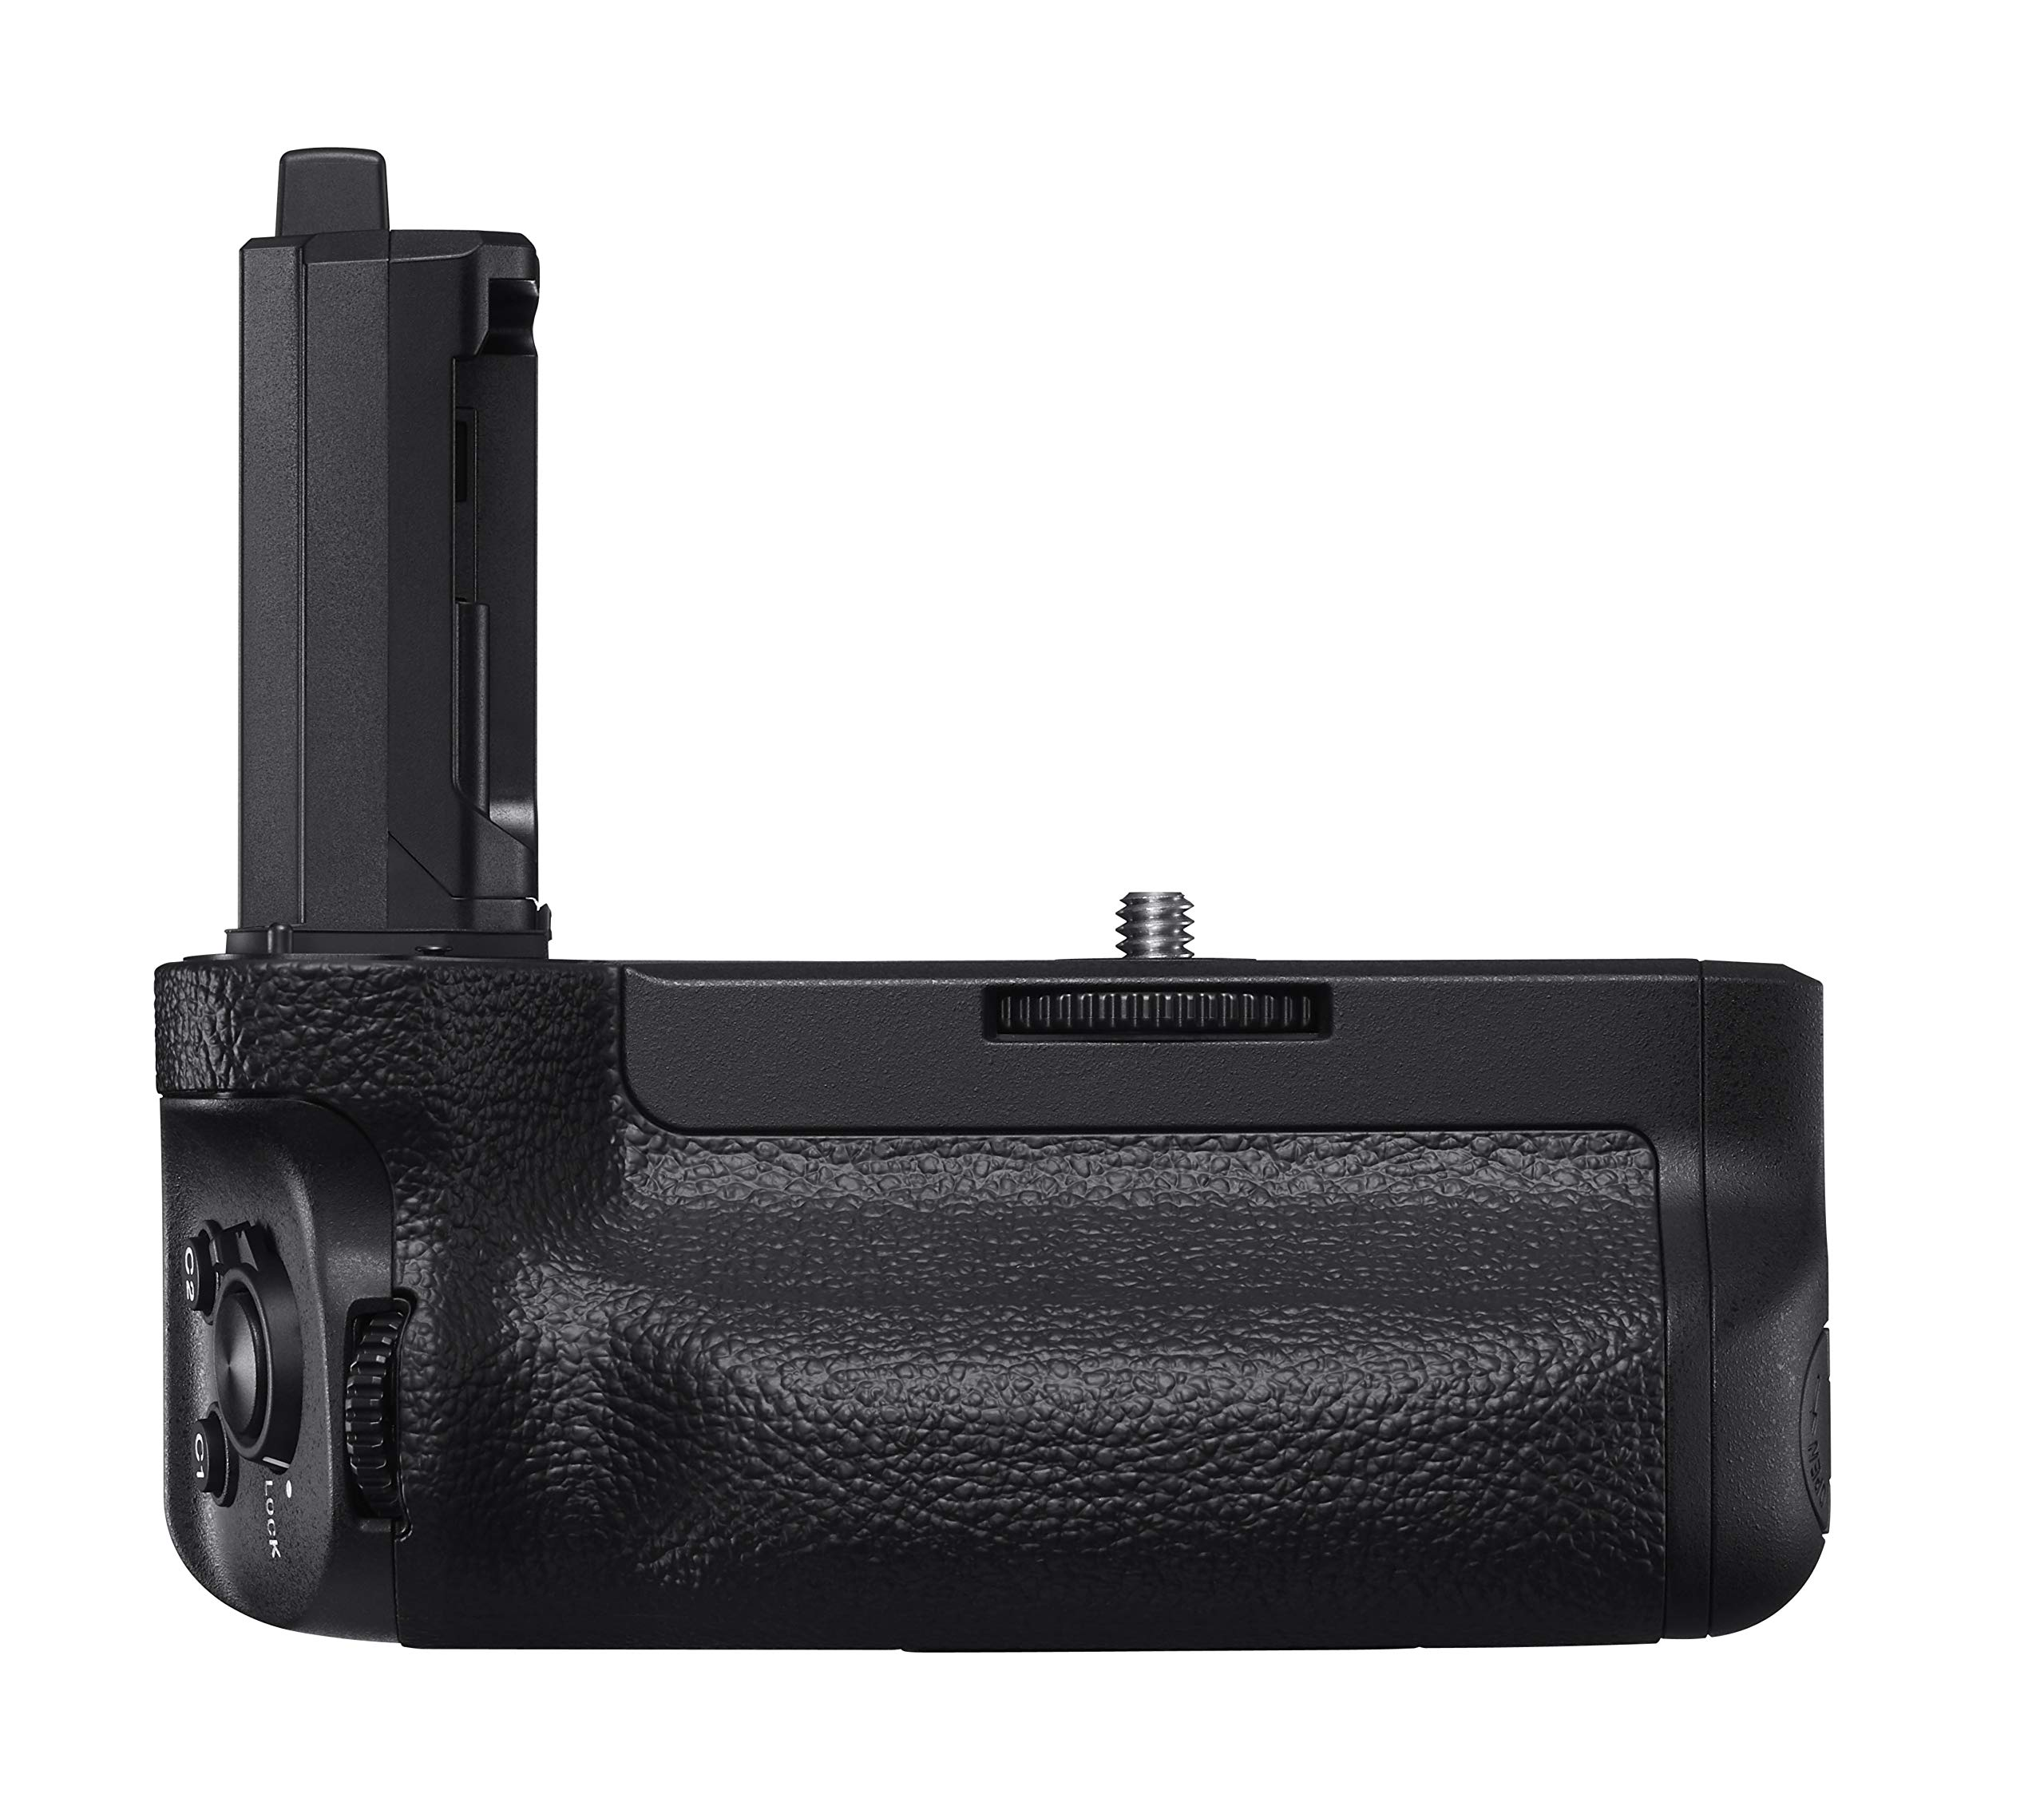 Vertical Grip for Sony Alpha 7R IV - VG-C4EM by Sony